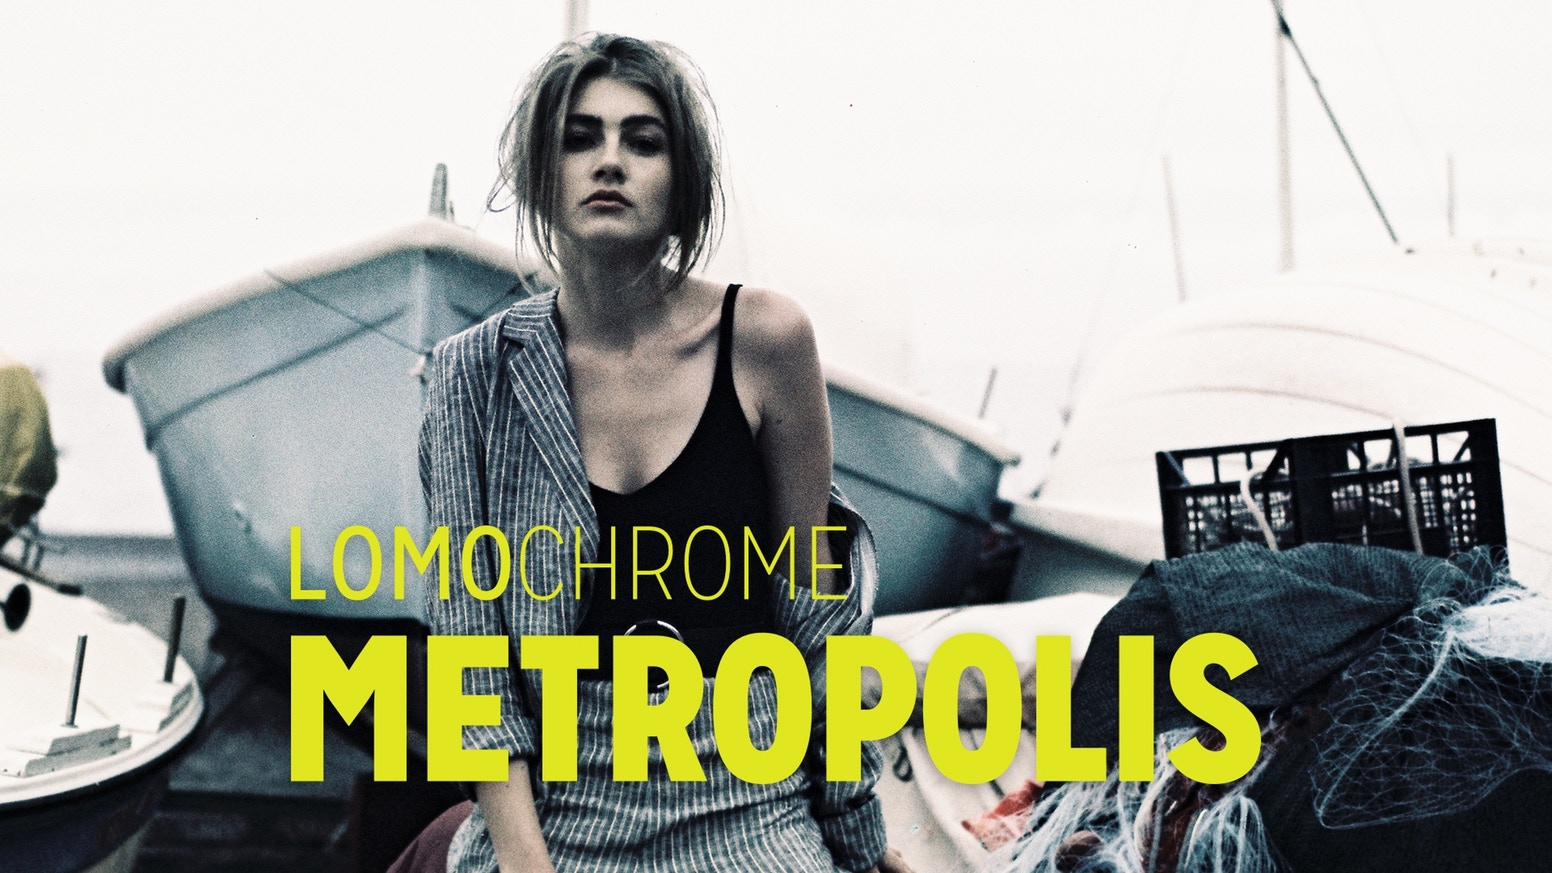 LomoChrome Metropolis XR 100-400 promotional images courtesy of Lomography